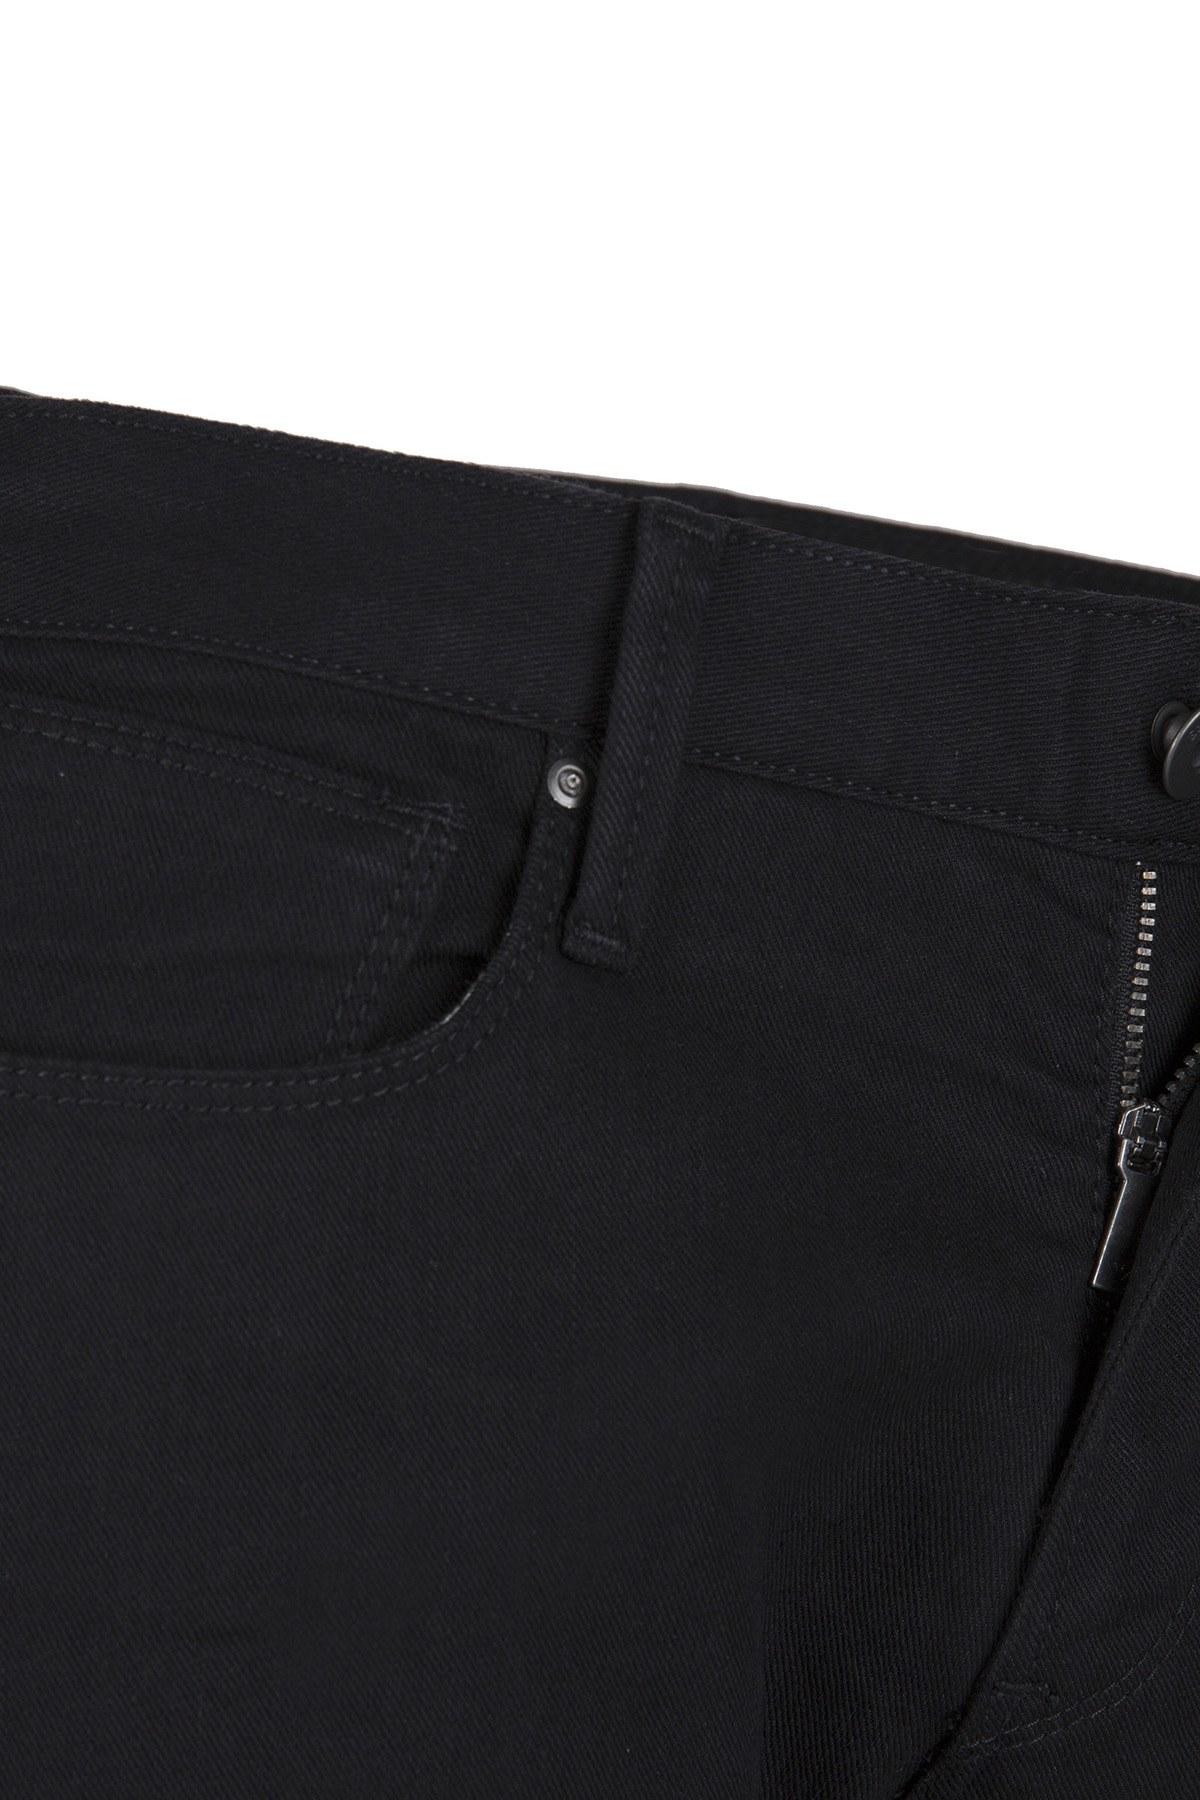 Emporio Armani J06 Jeans Erkek Pamuklu Pantolon 3Z1J06 1N4CZ SİYAH